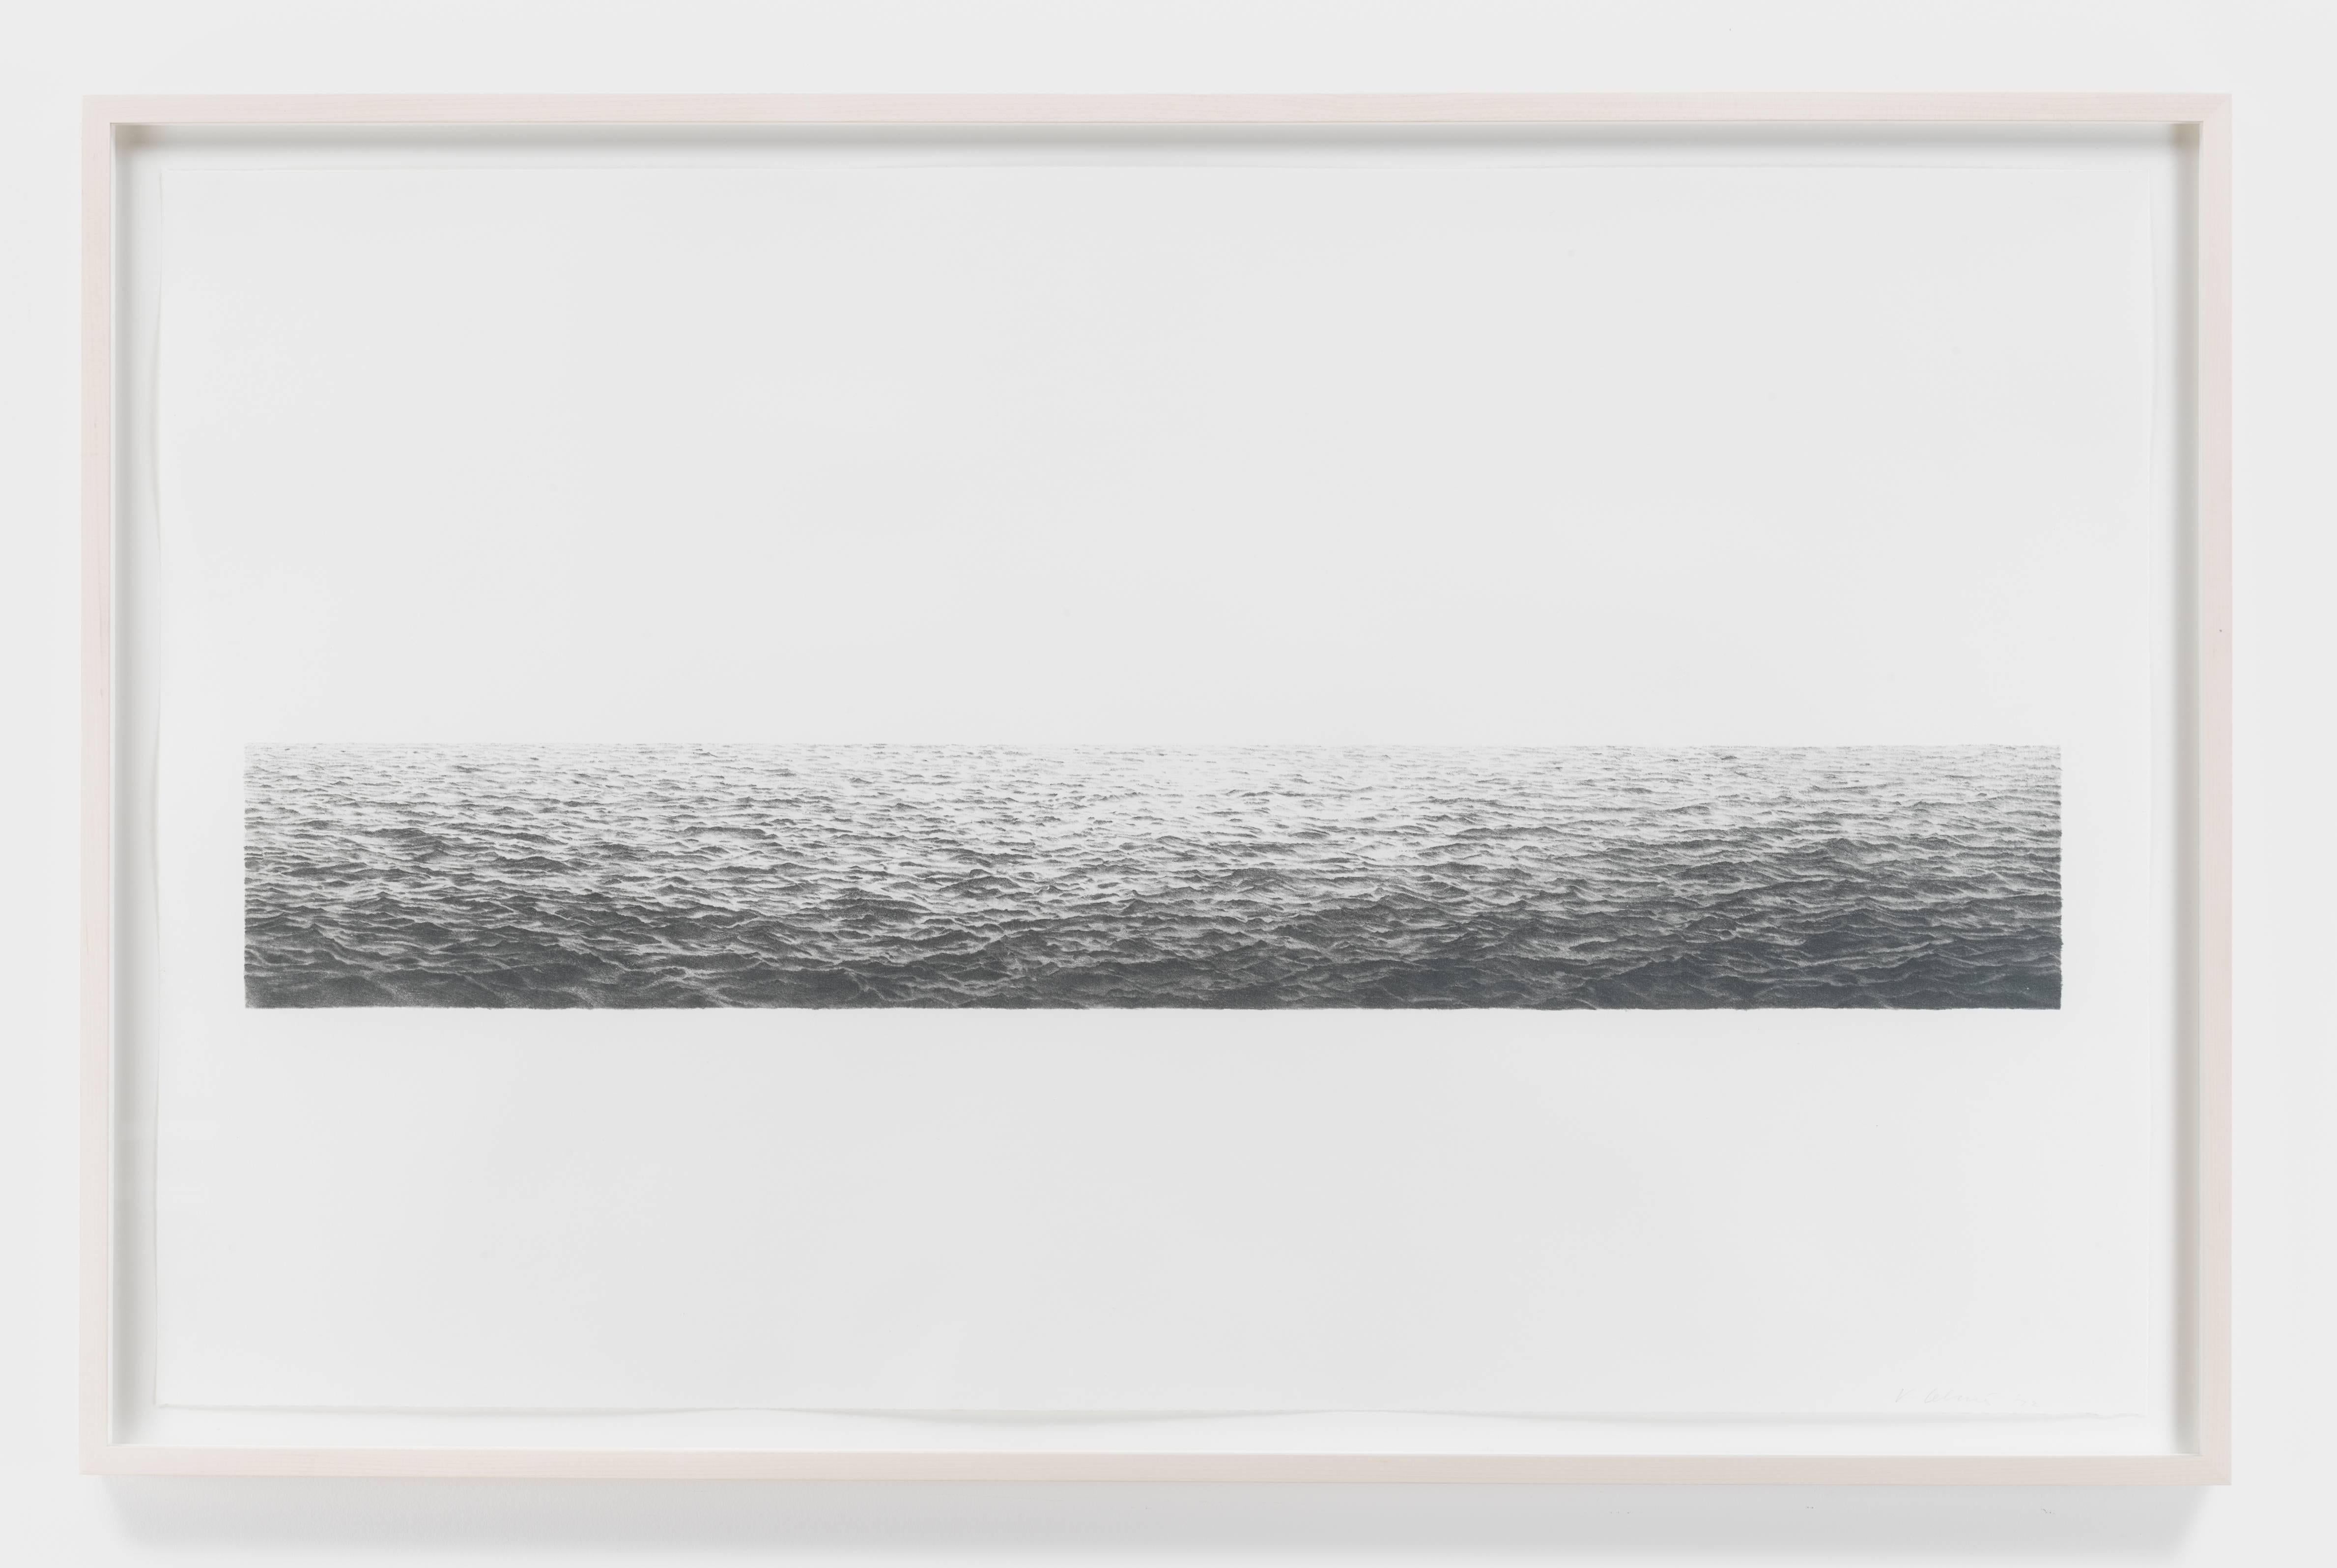 Vija Celmins Untitled Ocean Print For Sale At 1stdibs